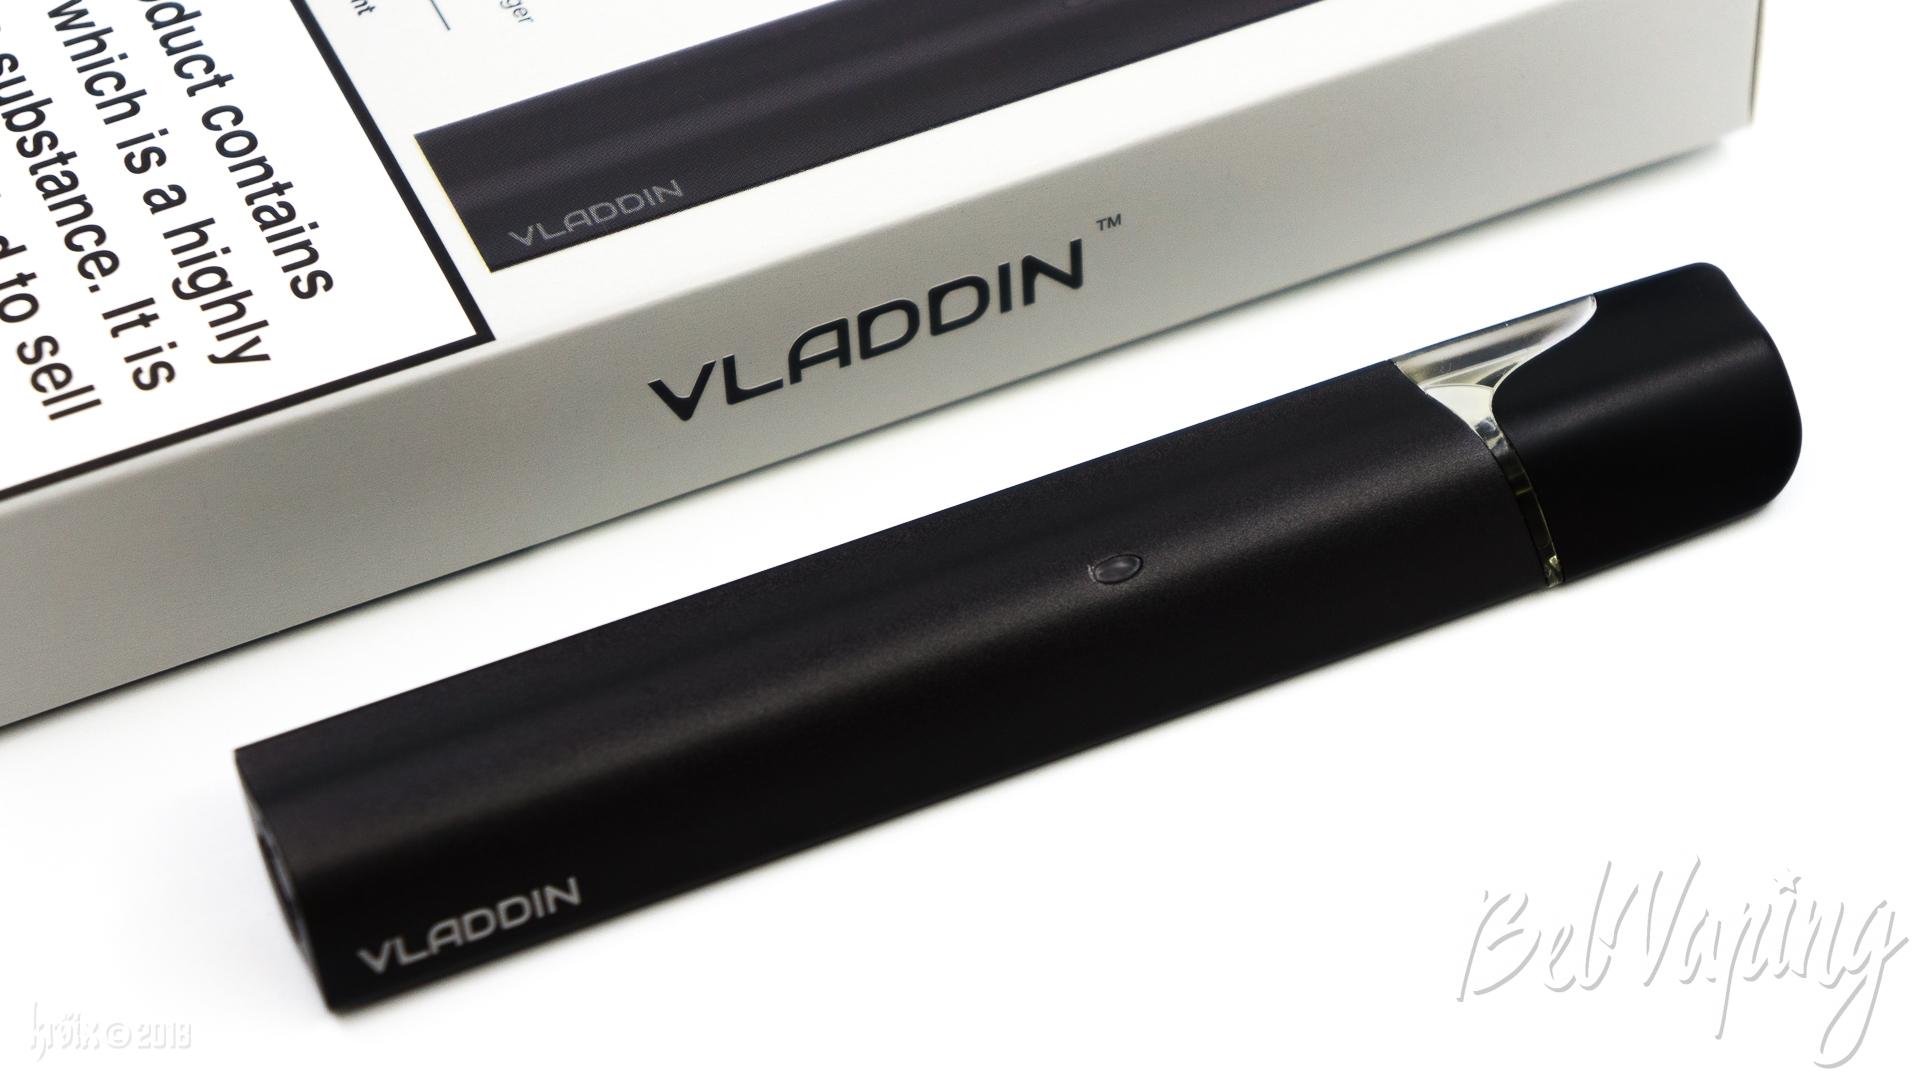 Обзор Vladdin Pod System Kit